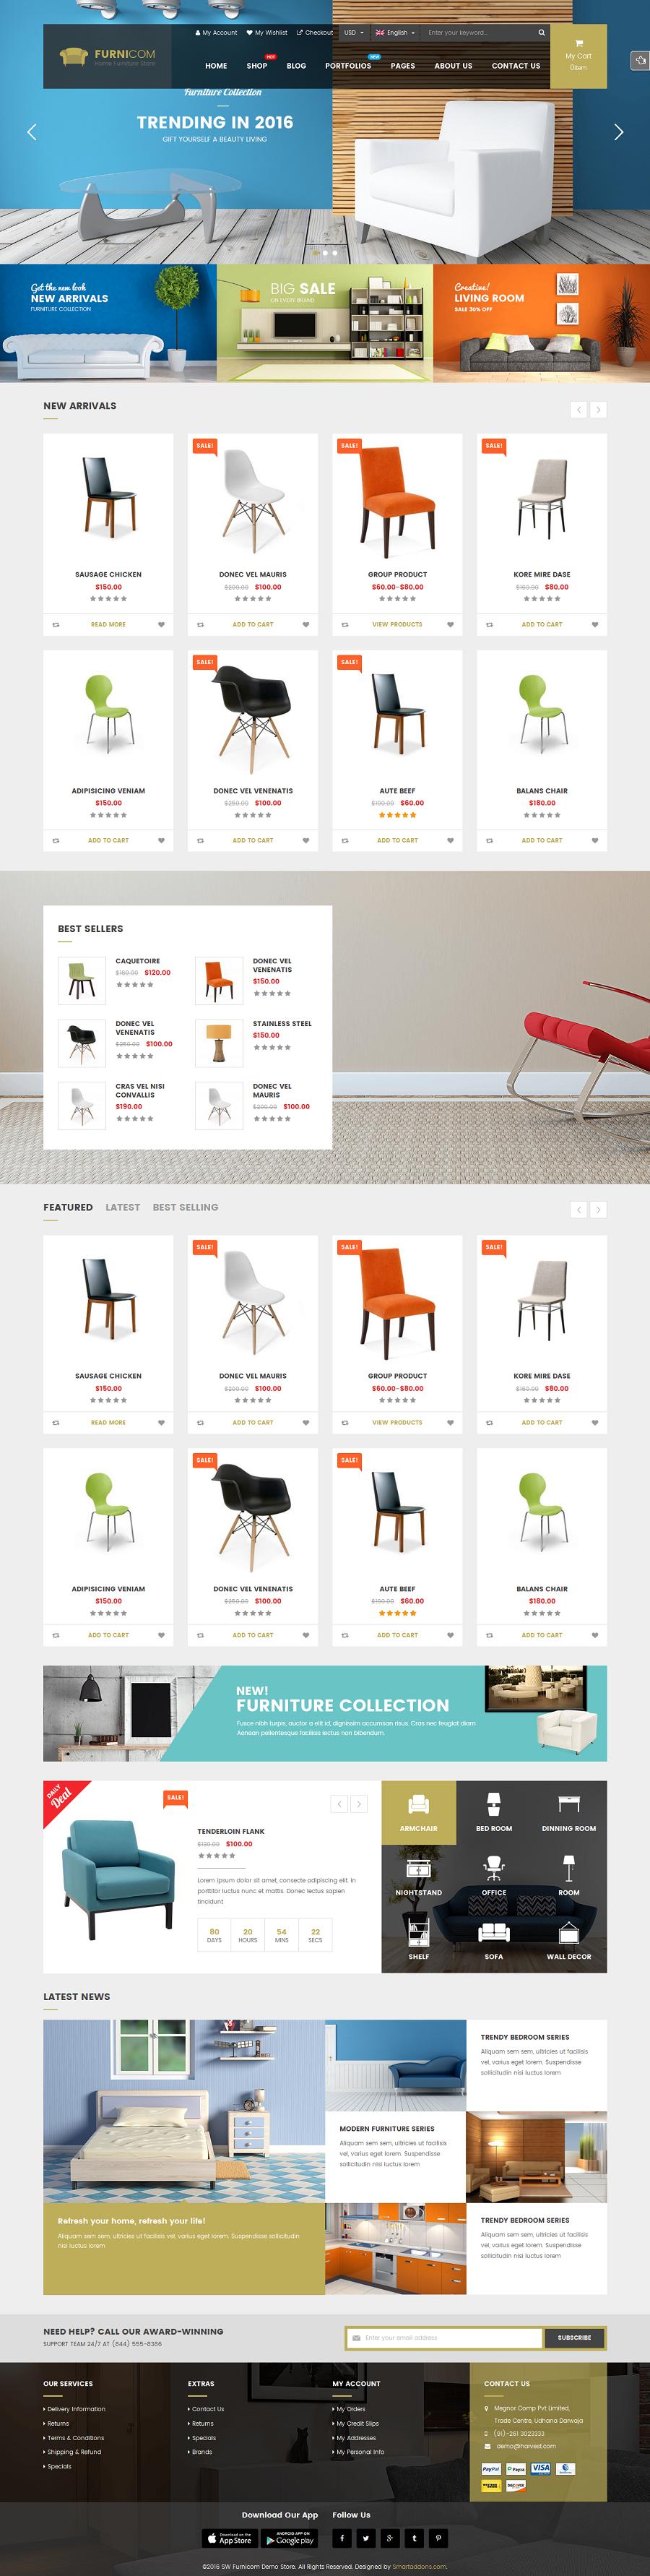 Furnicom   Fastest Furniture Store WooCommerce WordPress Theme (Mobile  Layouts Included)